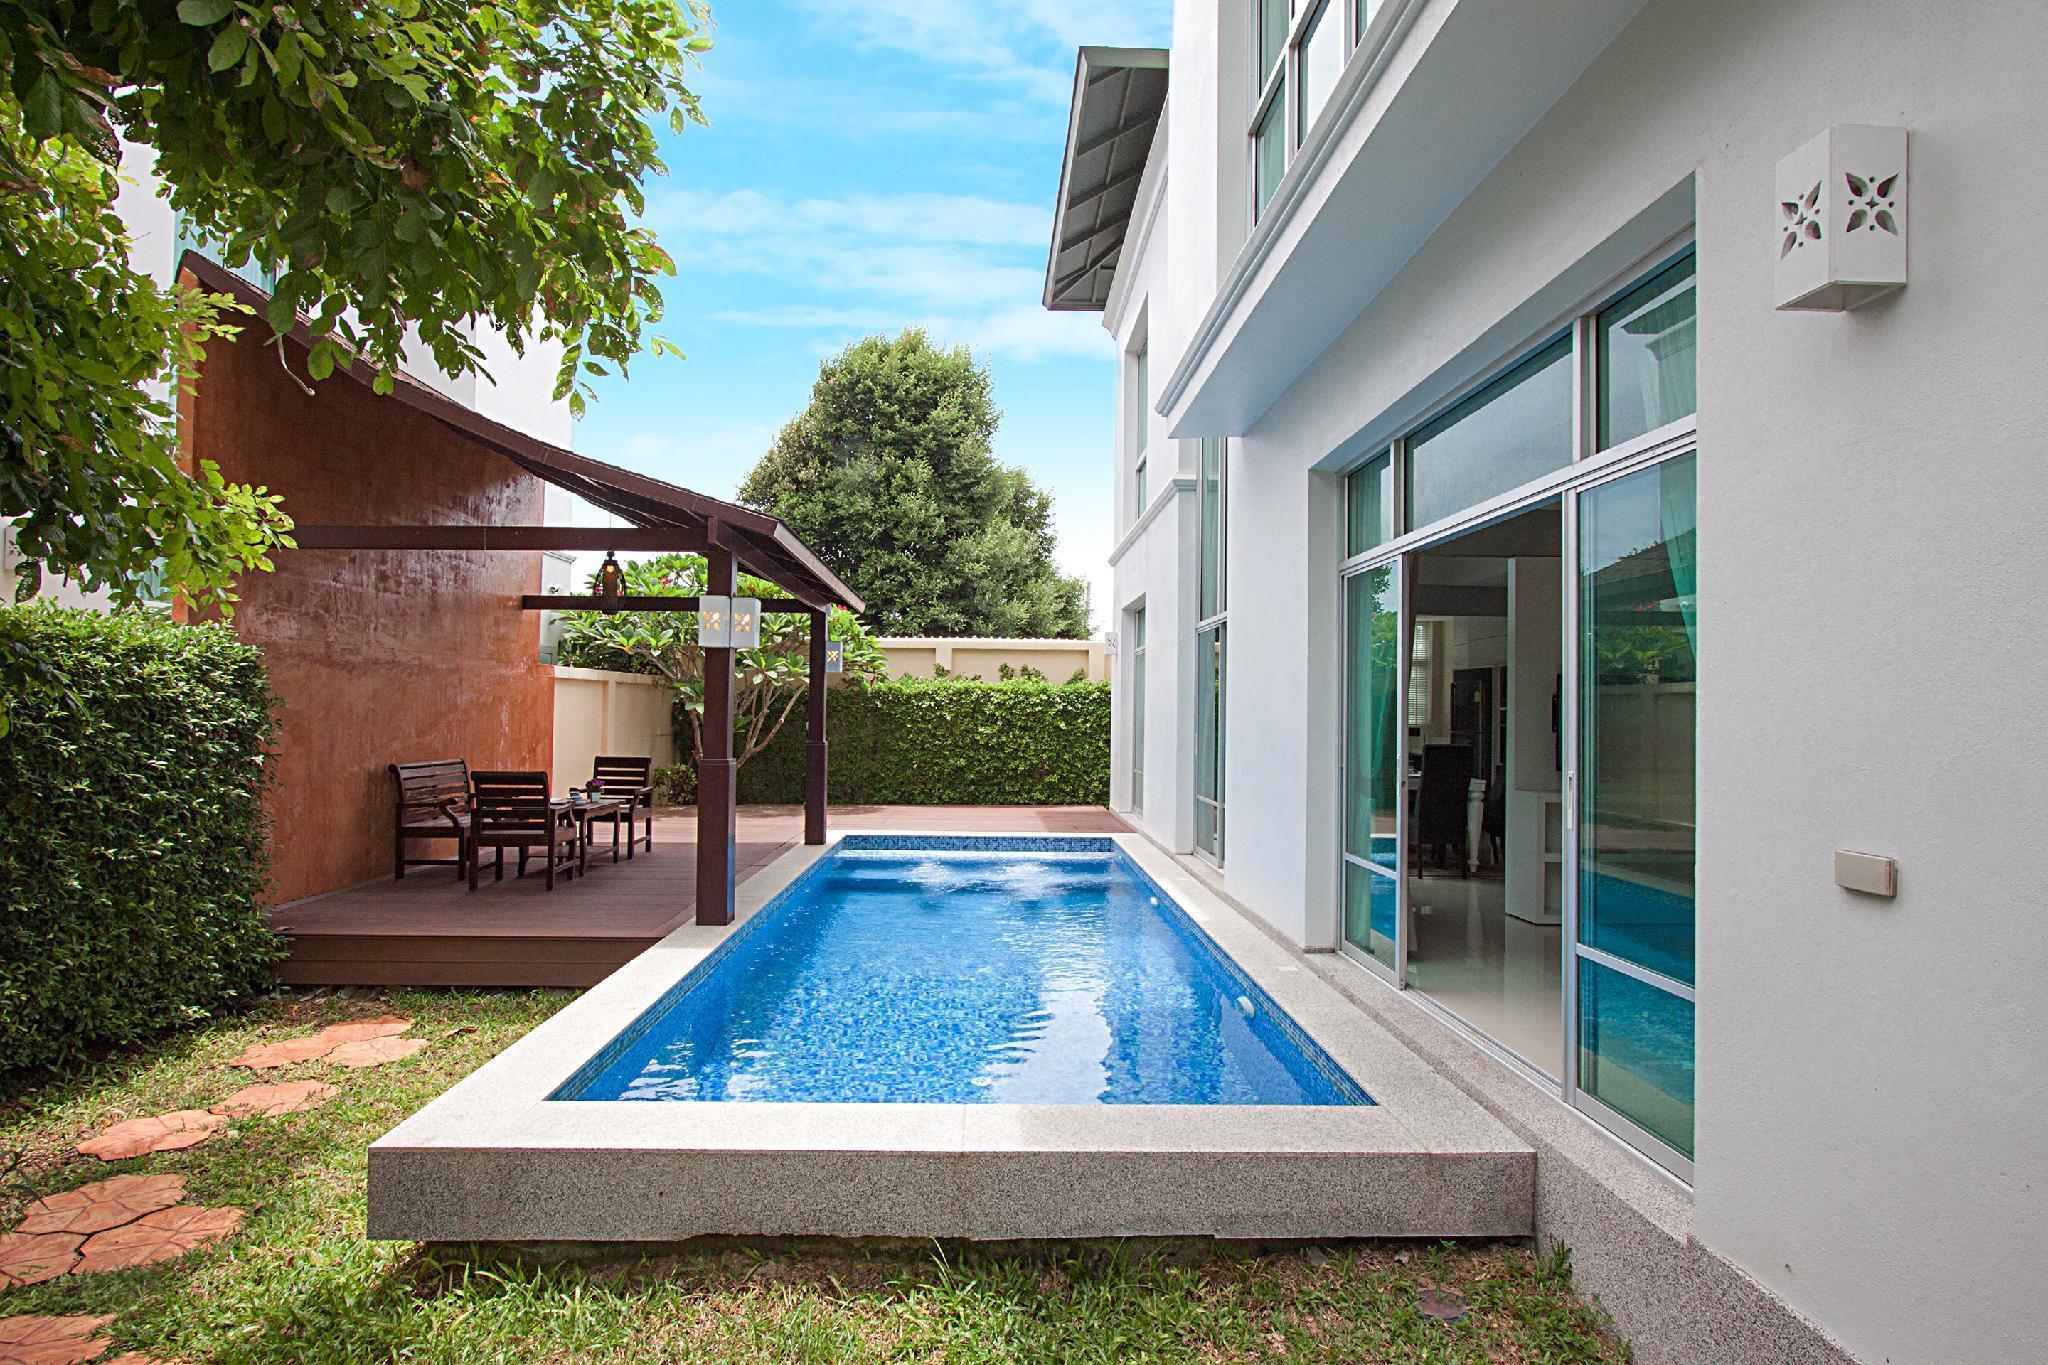 Villa Neo | 3 Bedroom Pool Villa in North Pattaya วิลลา 3 ห้องนอน 4 ห้องน้ำส่วนตัว ขนาด 220 ตร.ม. – พัทยาเหนือ